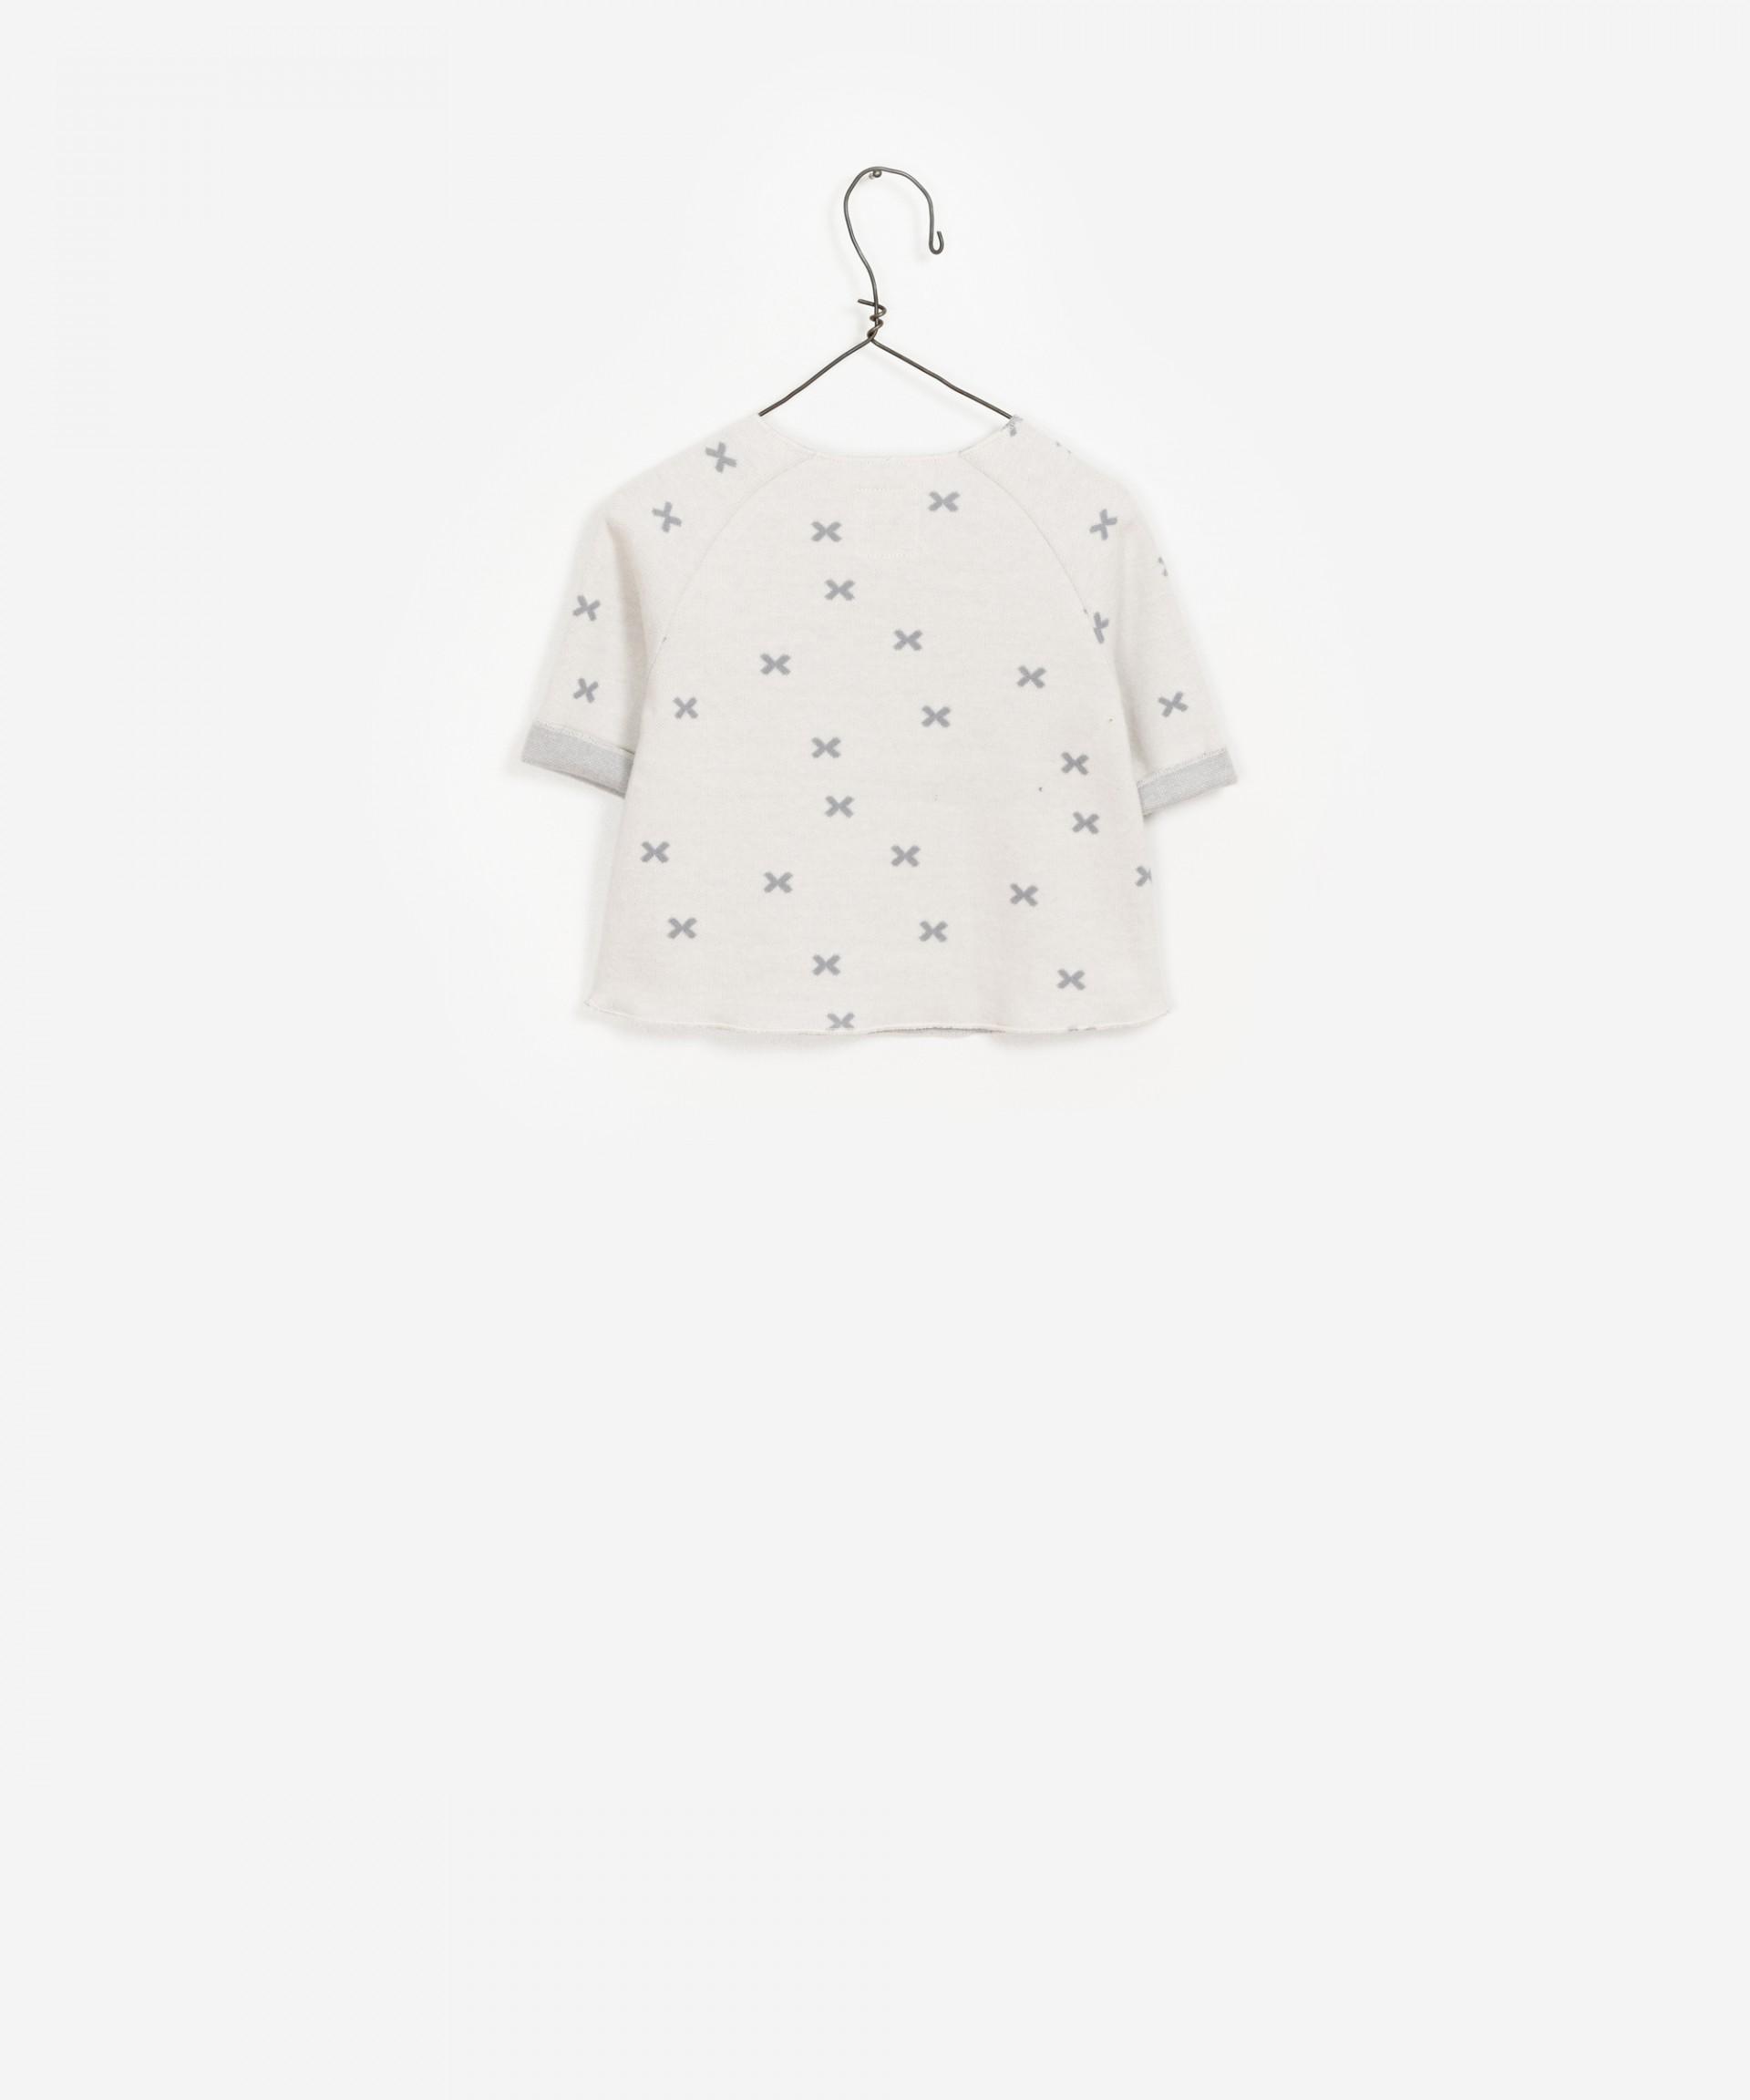 100% Organic Cotton Pocket Sweater